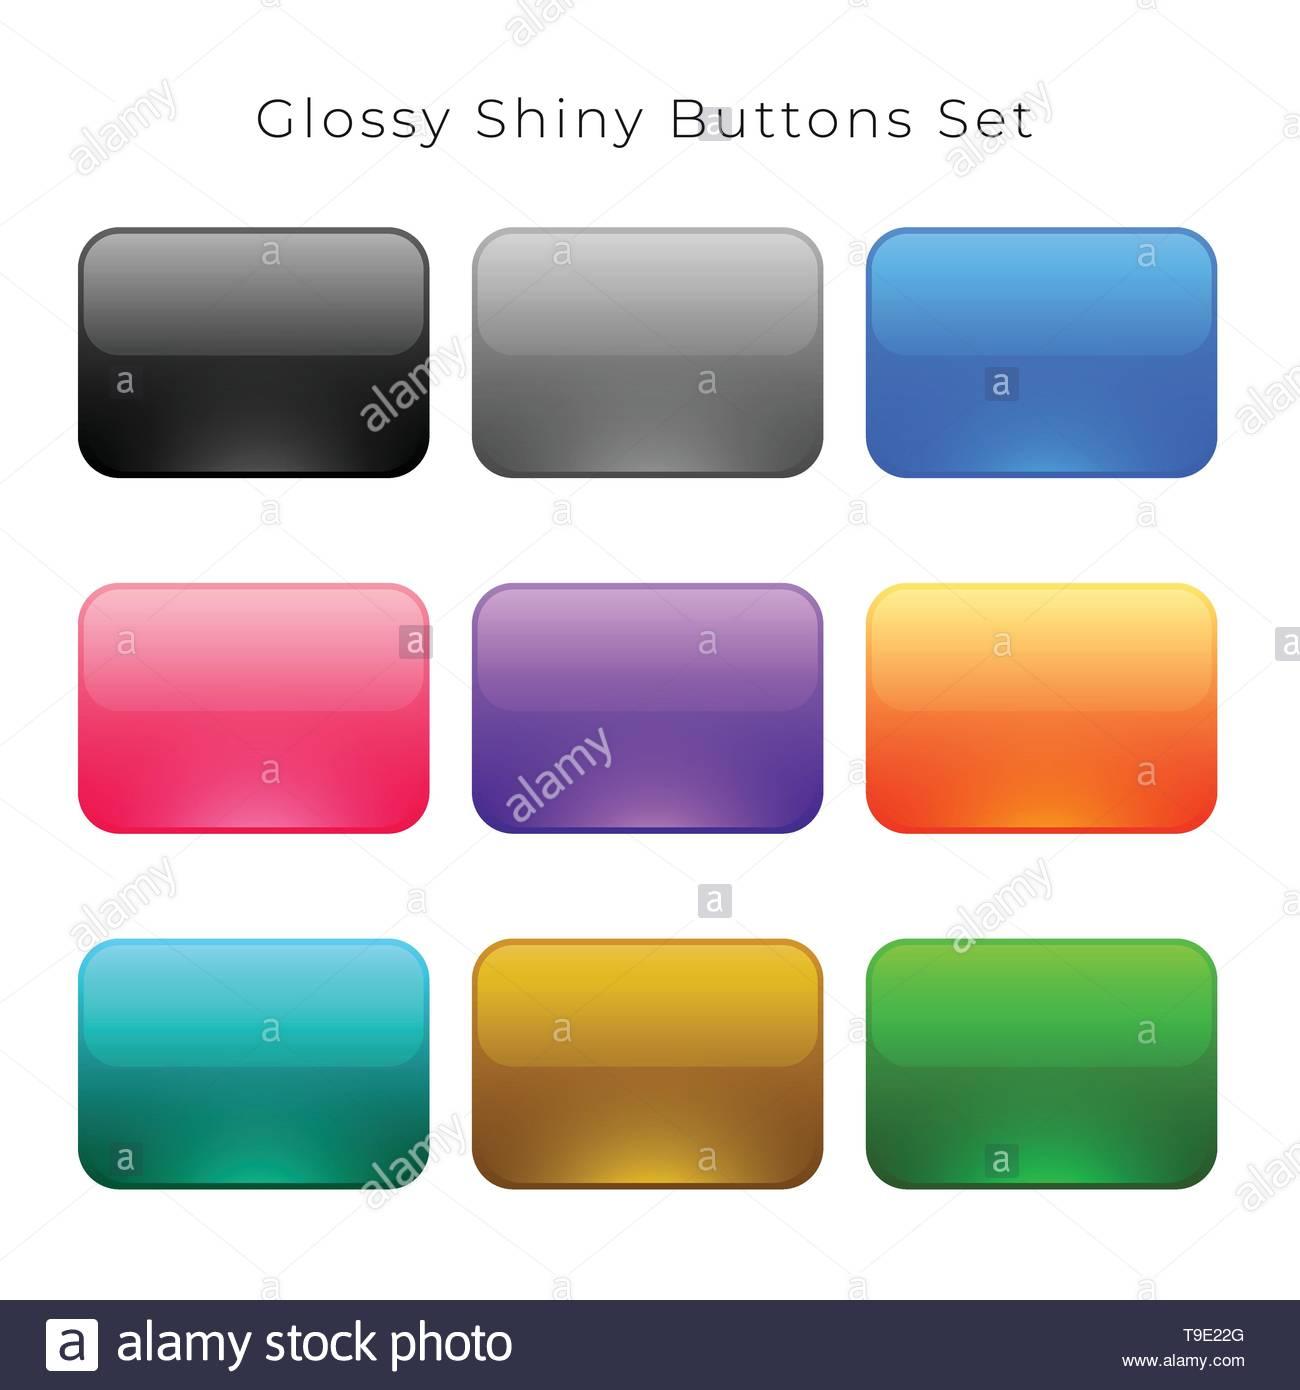 shiny glossy empty buttons set - Stock Image